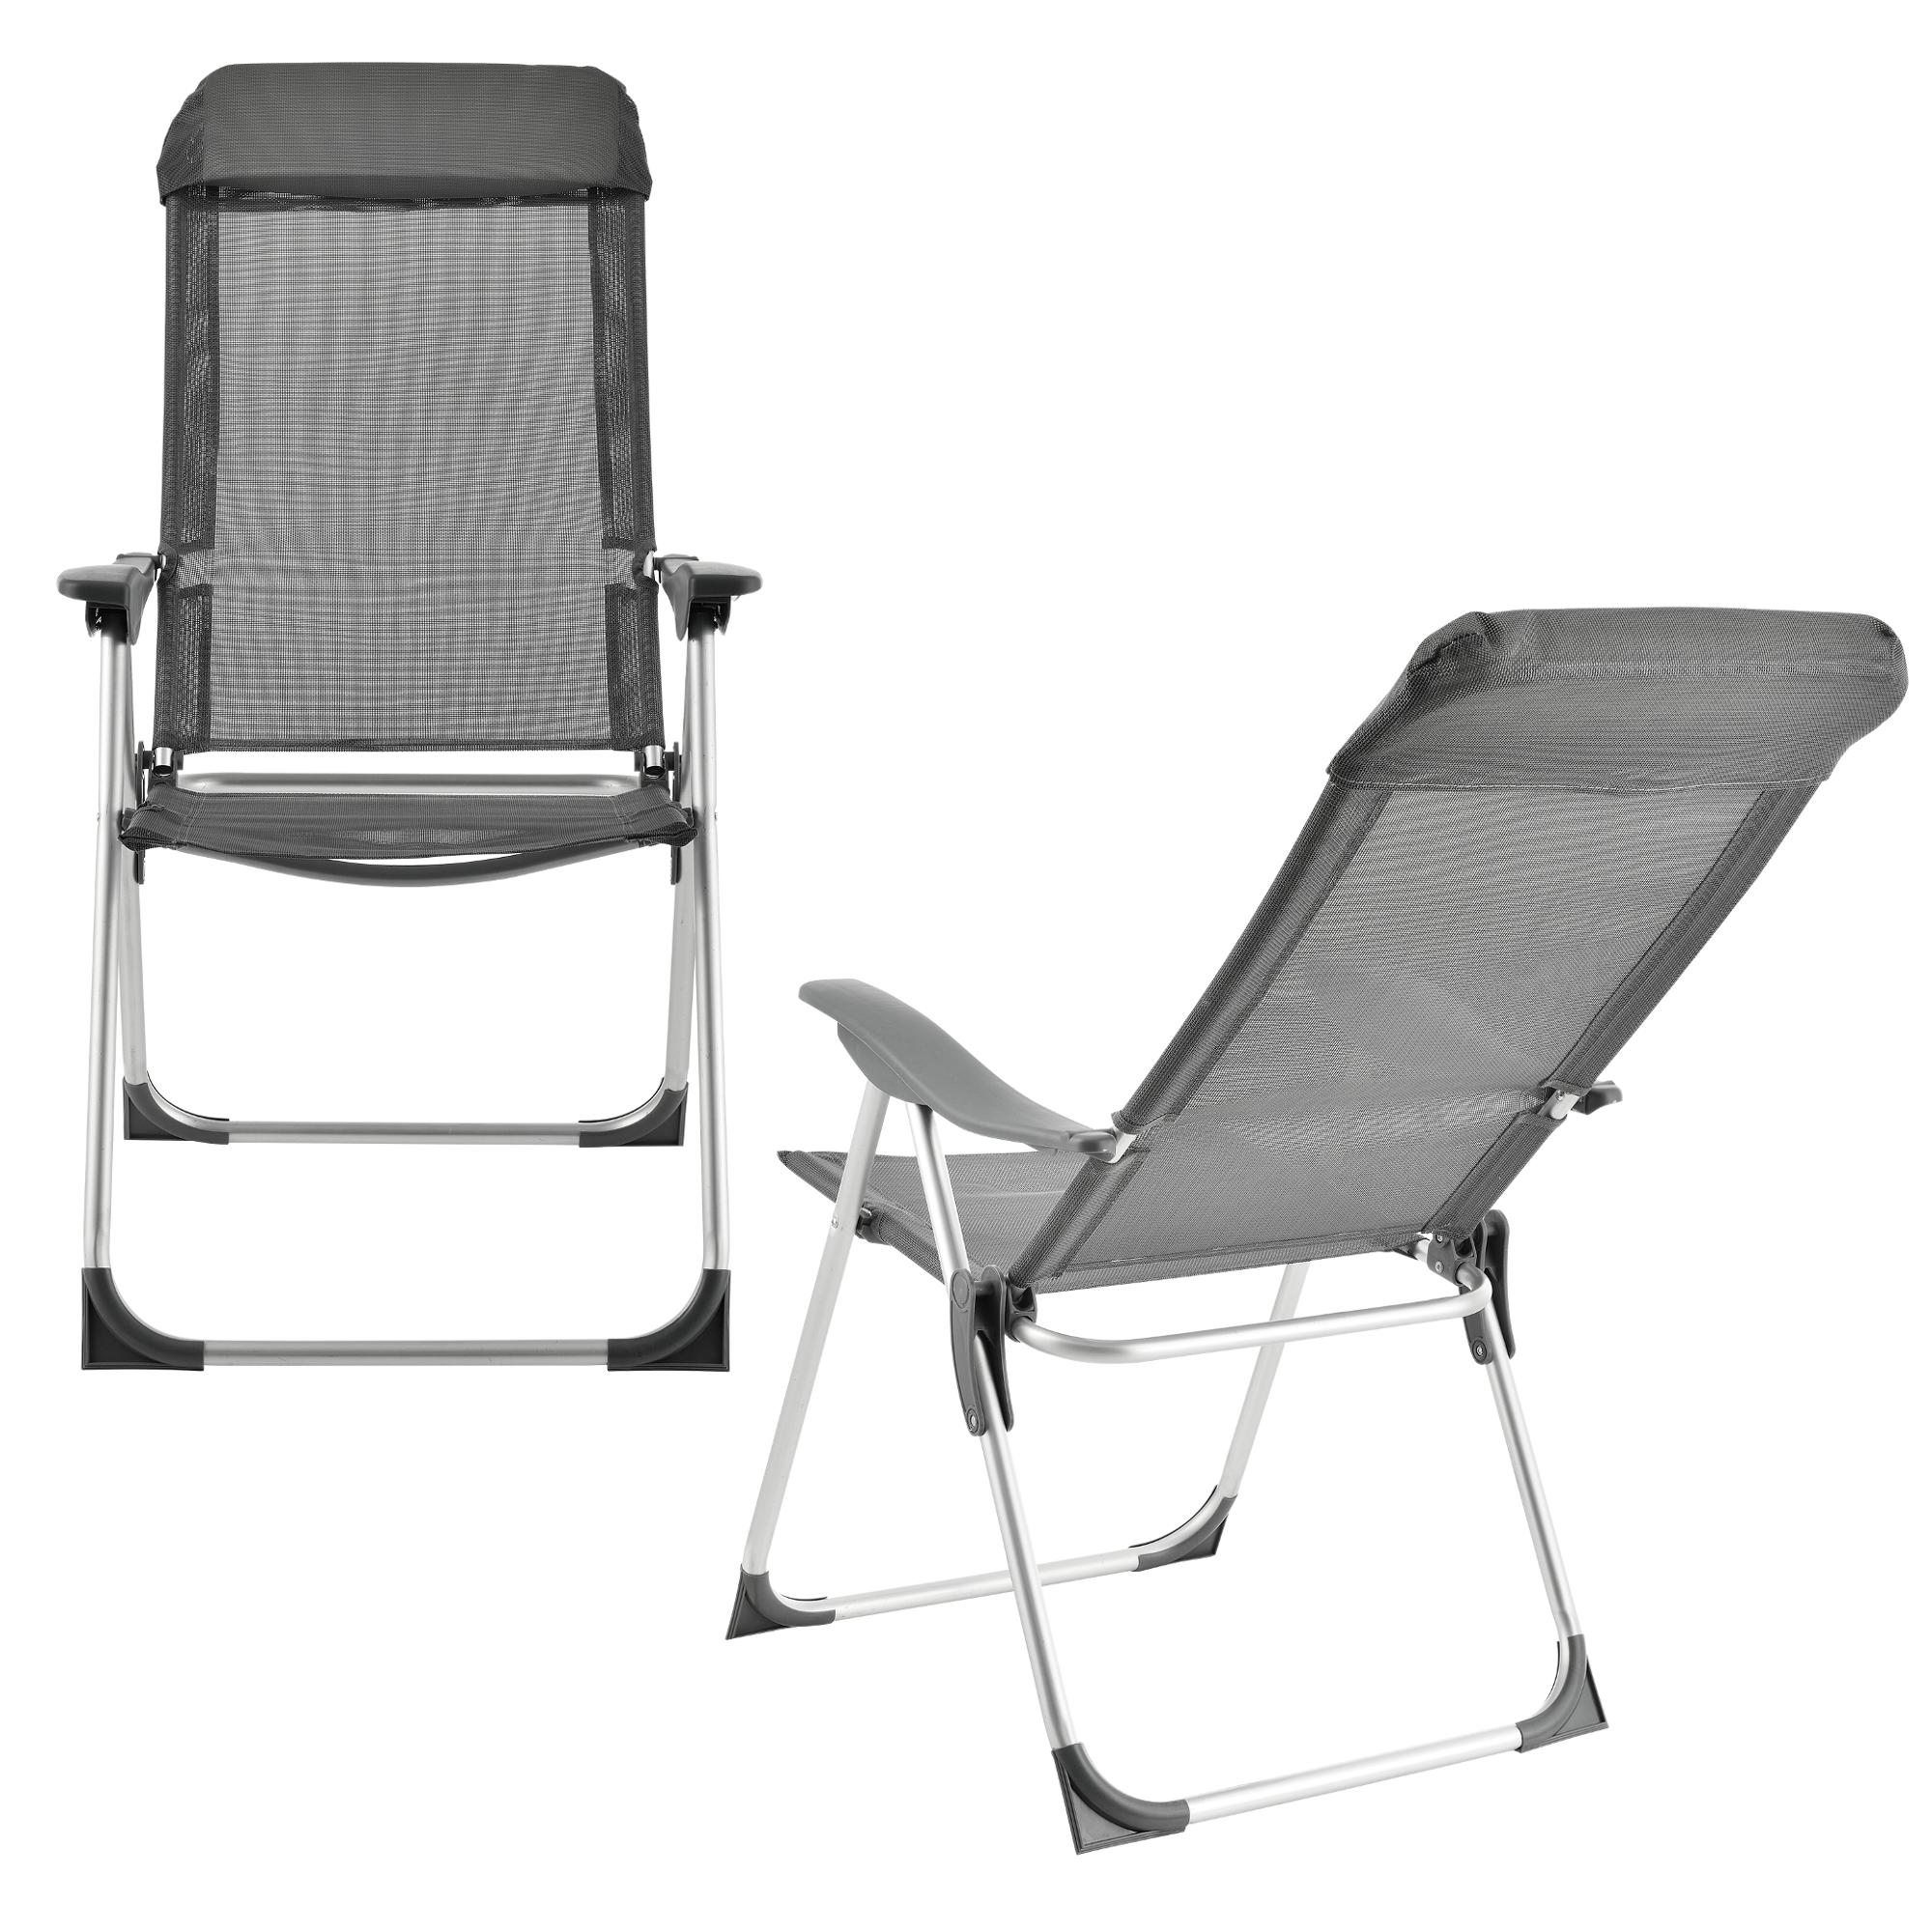 2x aluminium chaise de jardin camping pliante for Chaise de camping pliante